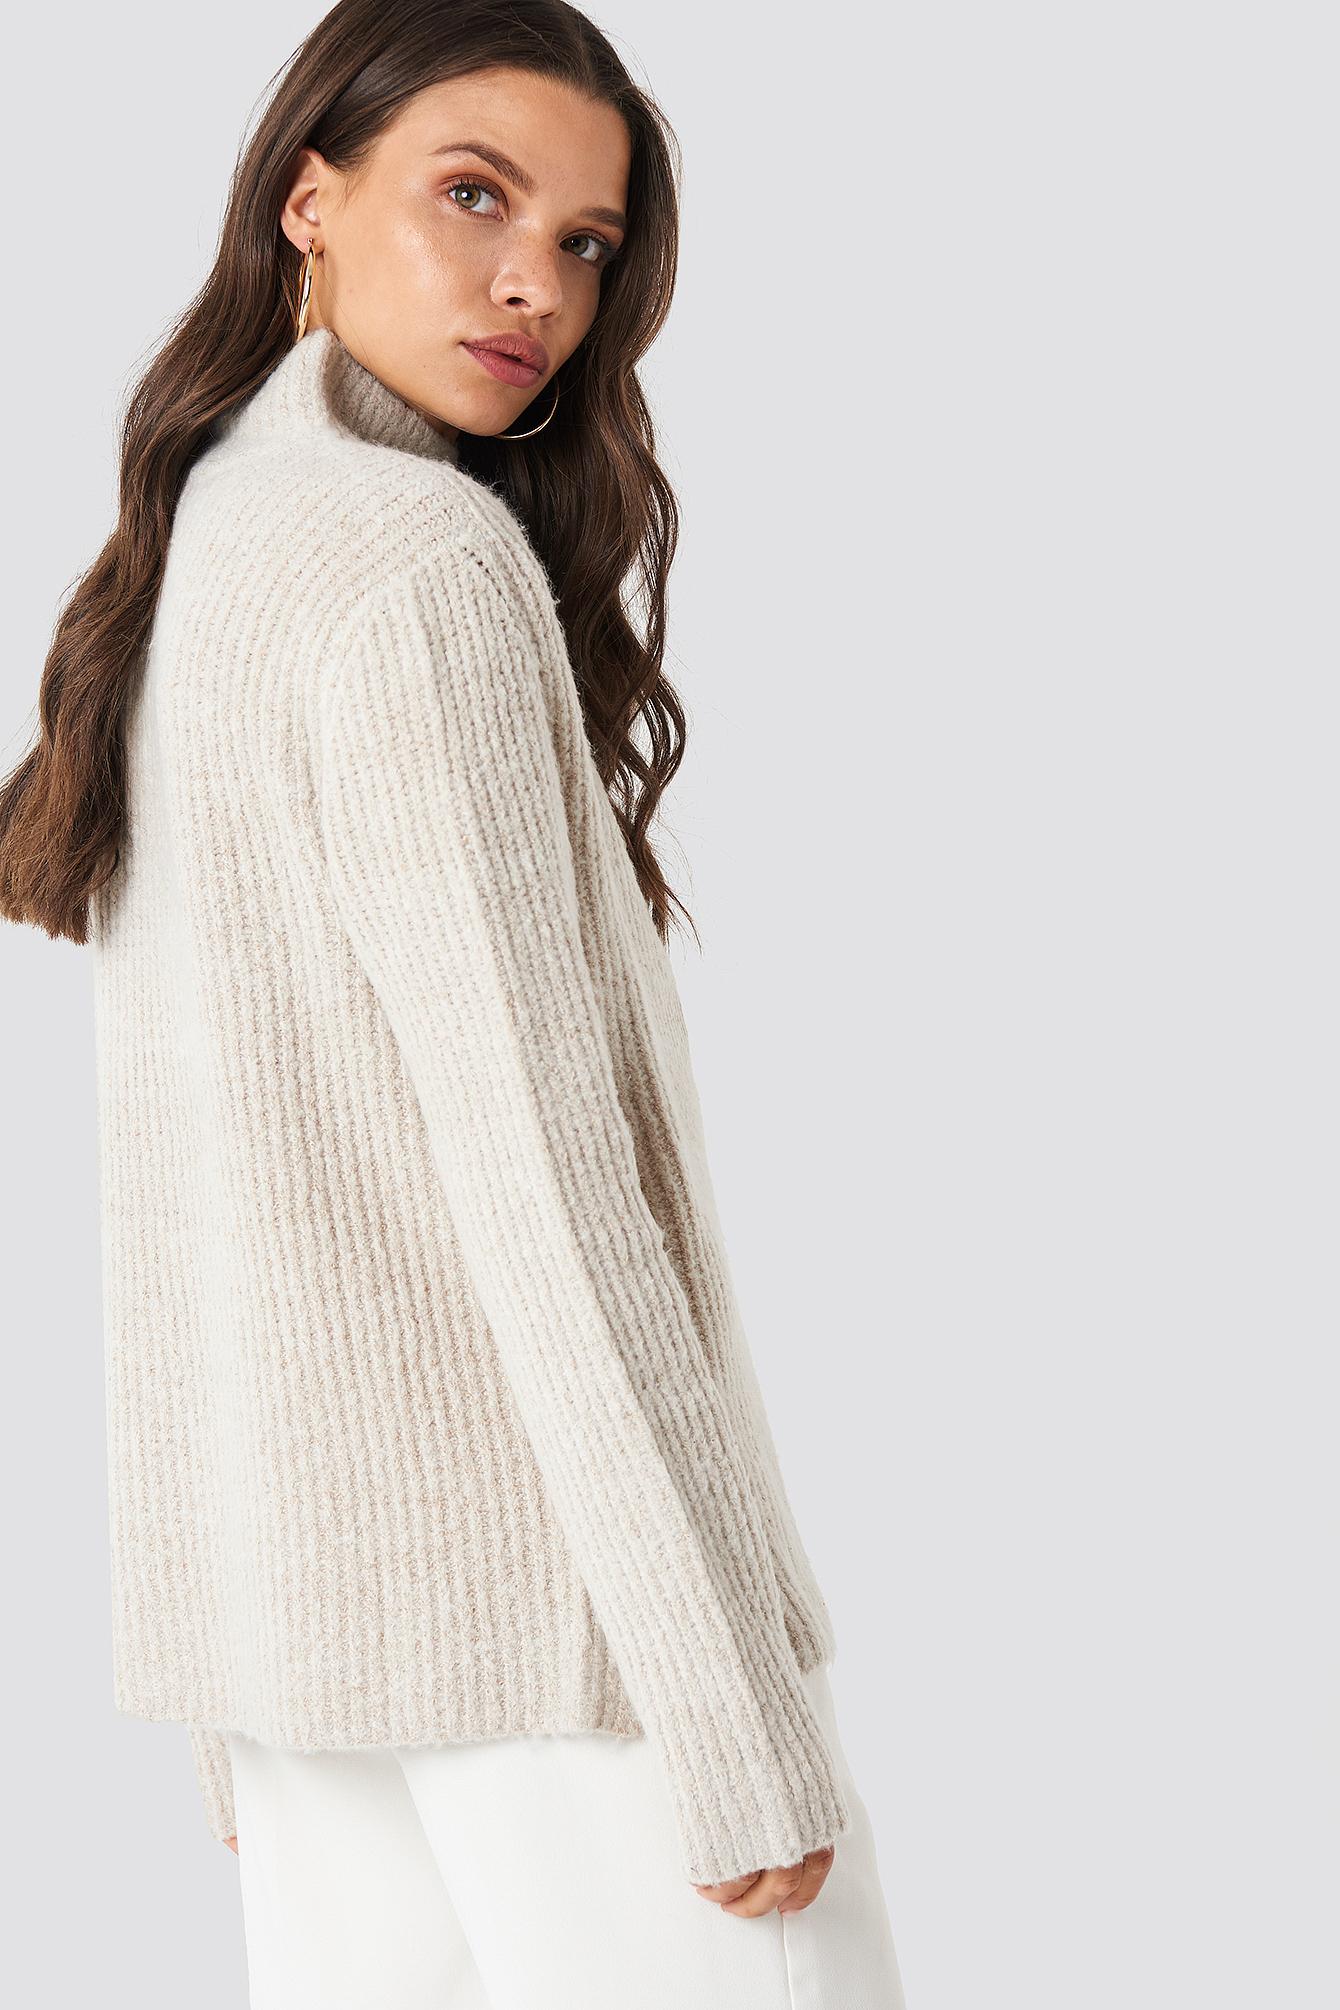 Sweter z dzianiny Marielle NA-KD.COM